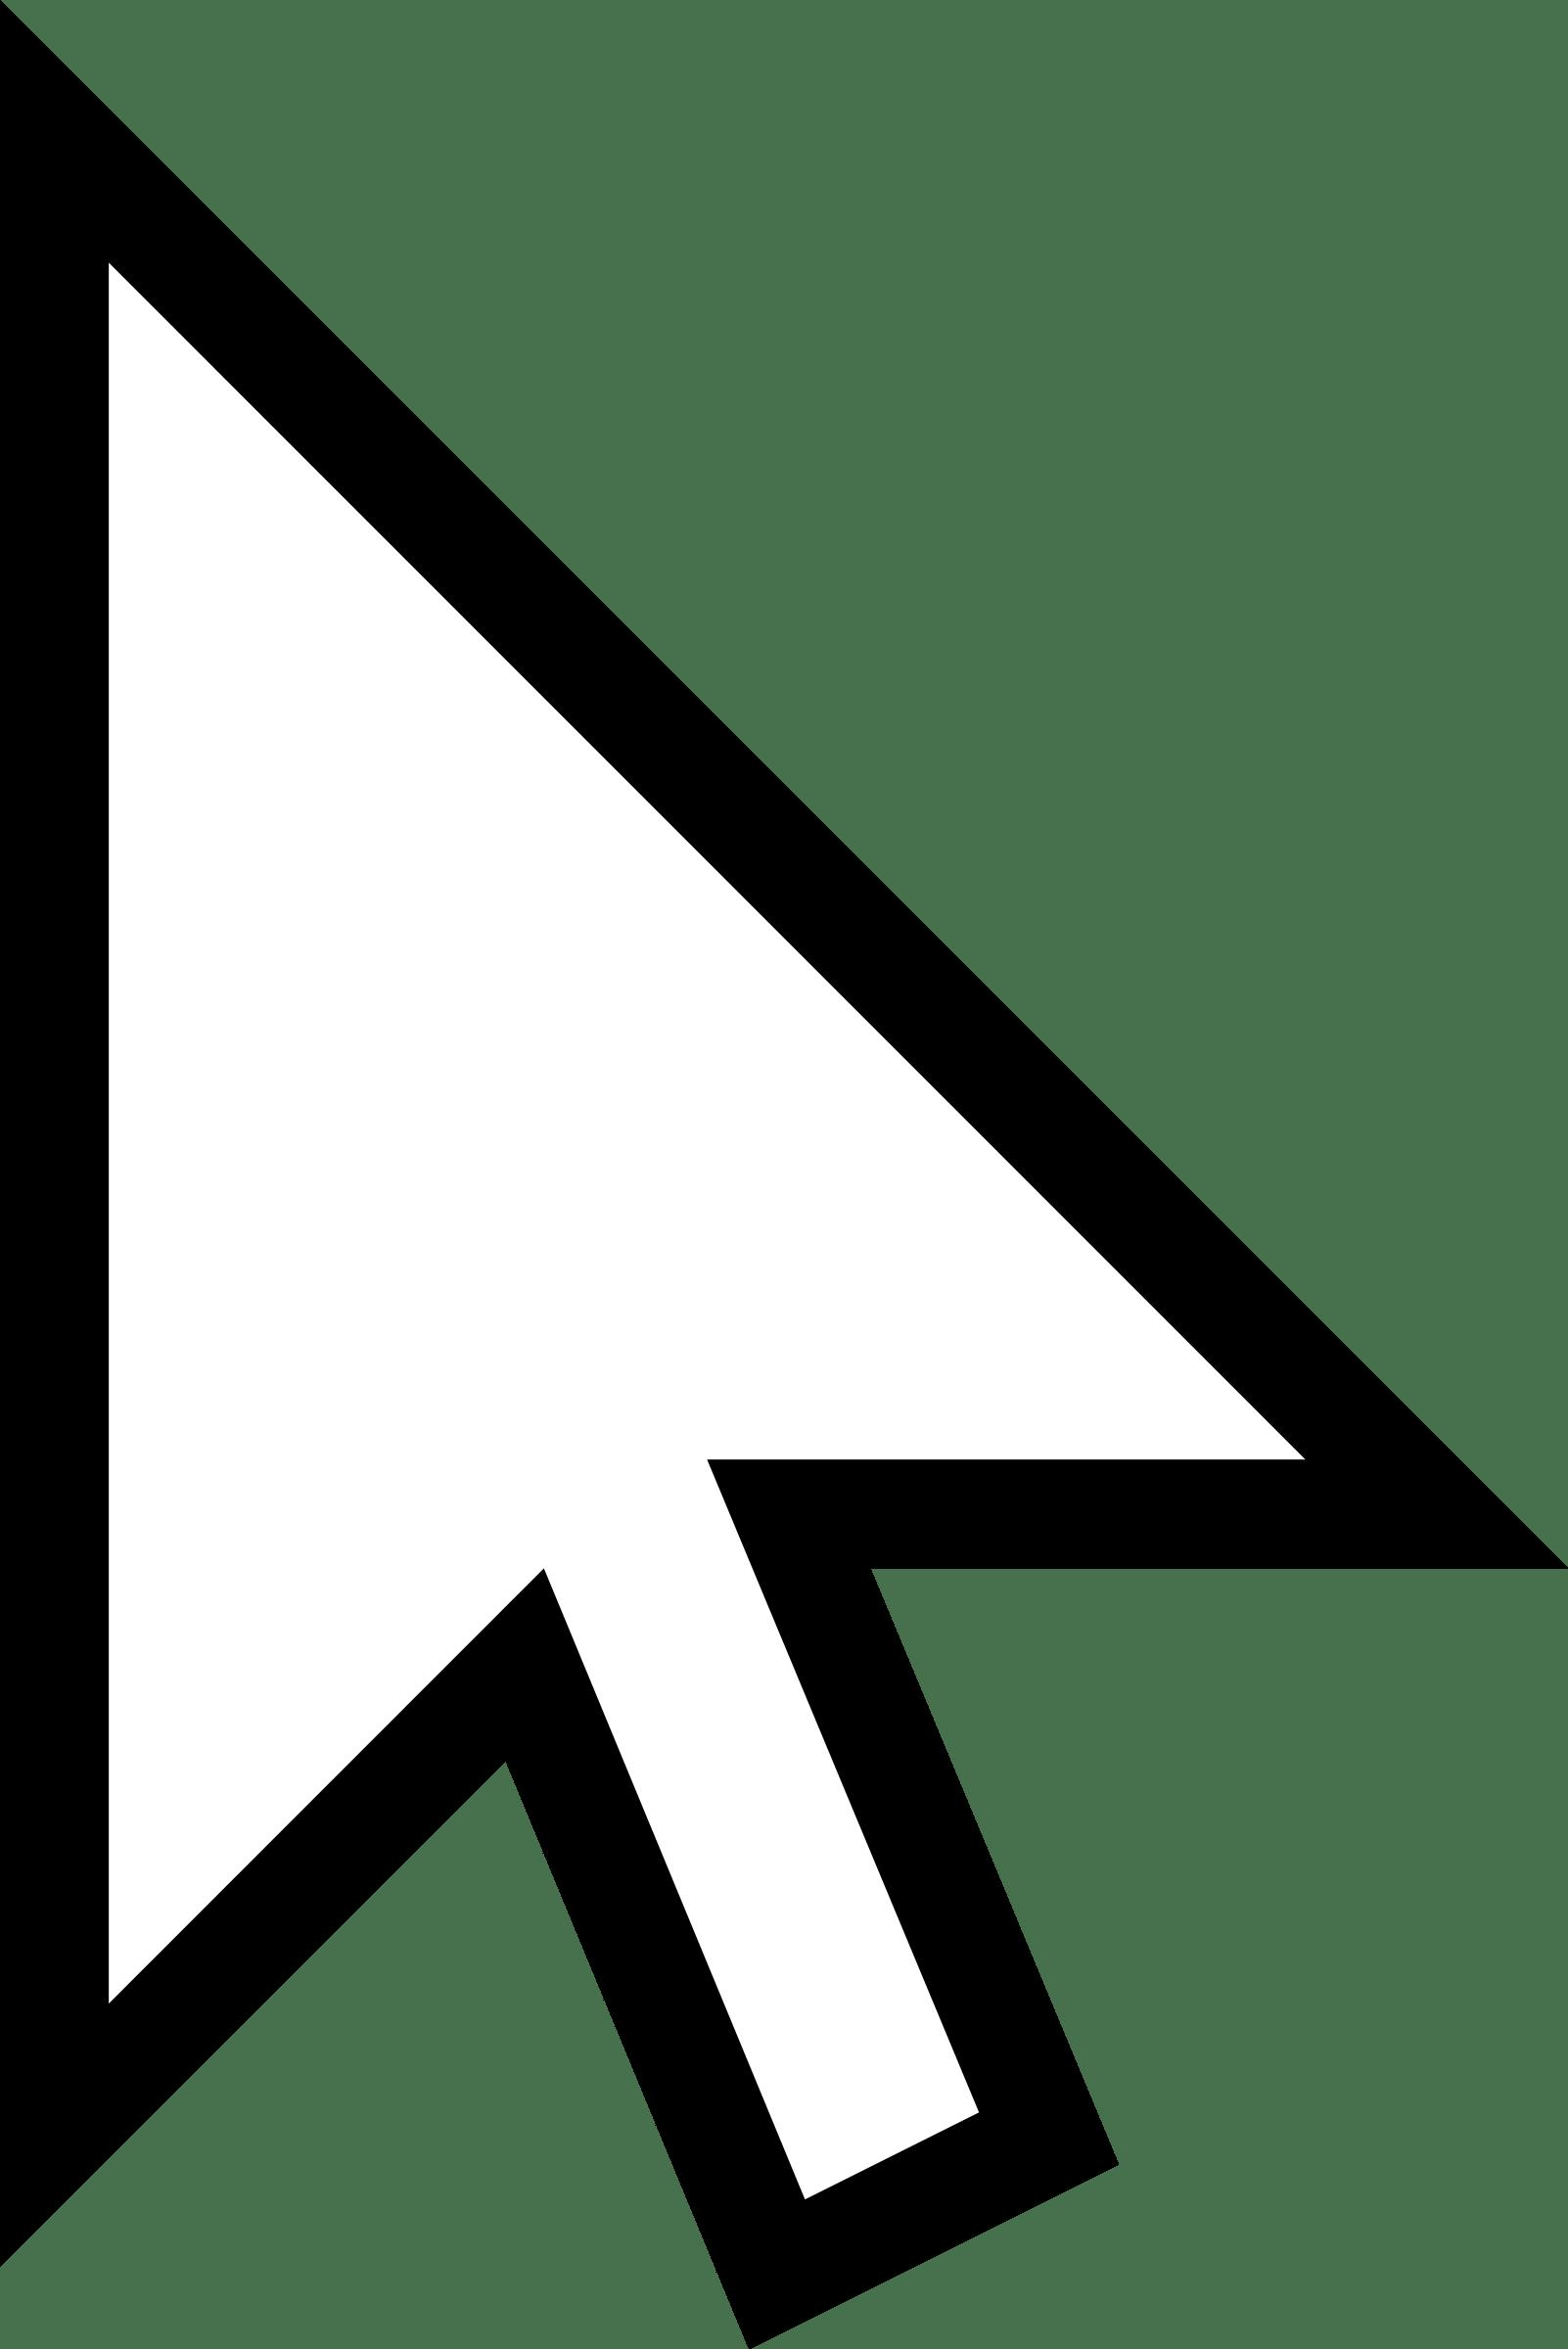 Clipart arrows creative. Transparent png images page